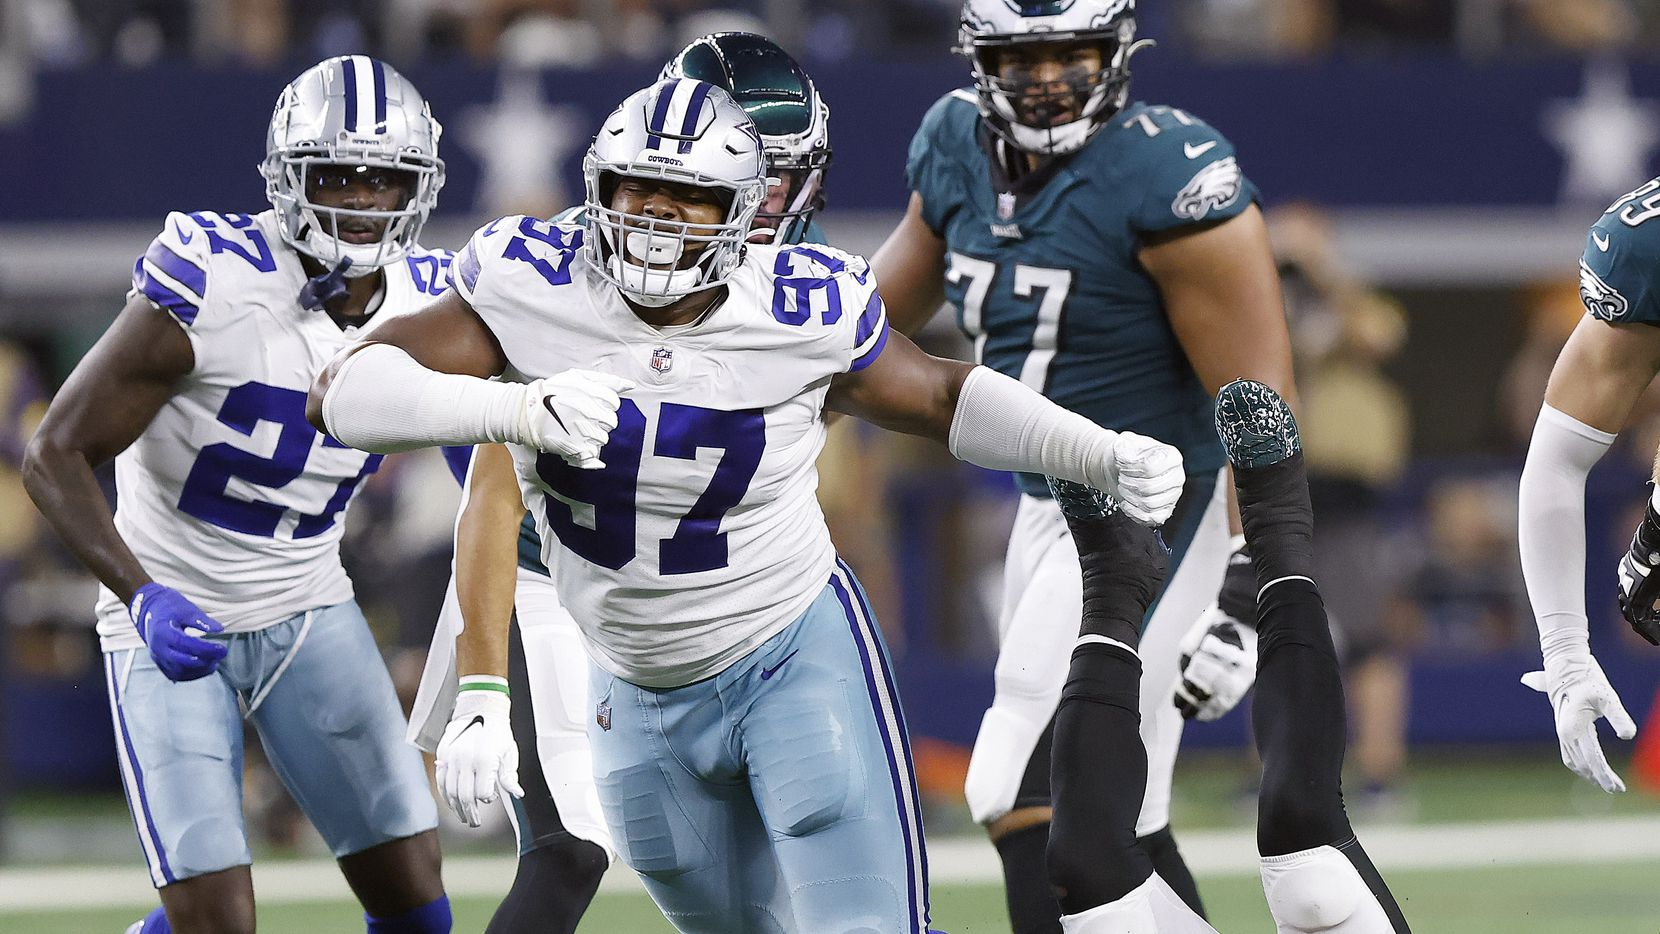 Dallas Cowboys defensive tackle Osa Odighizuwa (97) celebrates his third quarter sack of Philadelphia Eagles quarterback Jalen Hurts (1) during the second quarter at AT&T Stadium in Arlington, Monday, September 27, 2021. (Tom Fox/The Dallas Morning News)